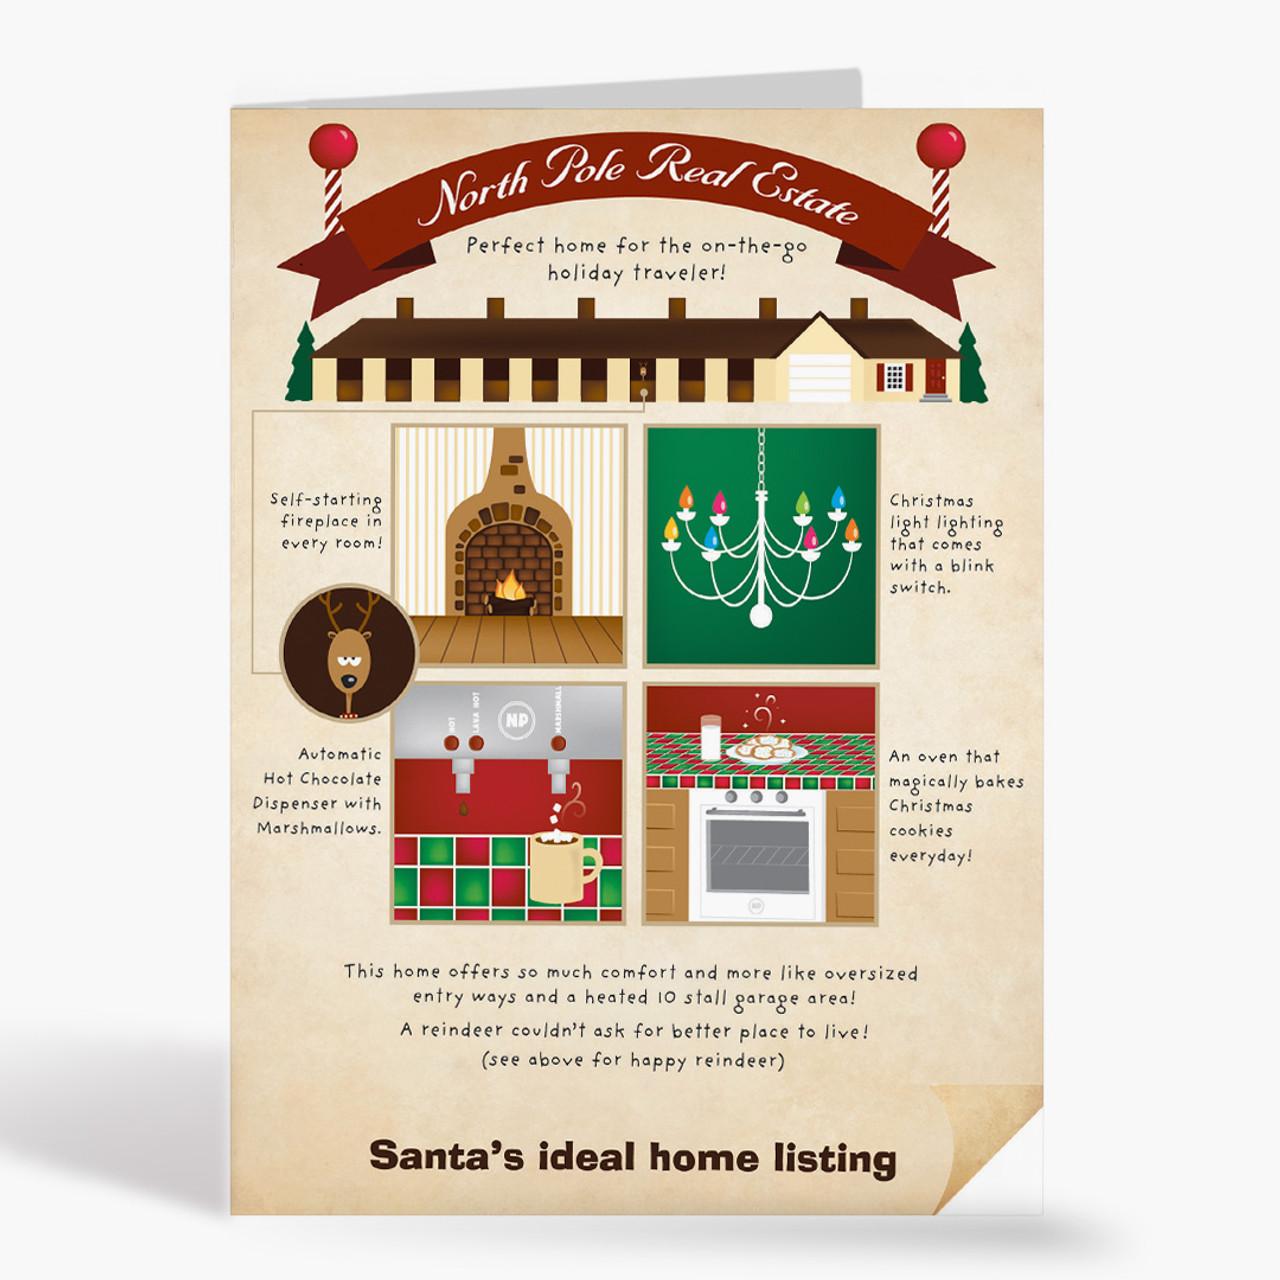 Santa's Ideal Home